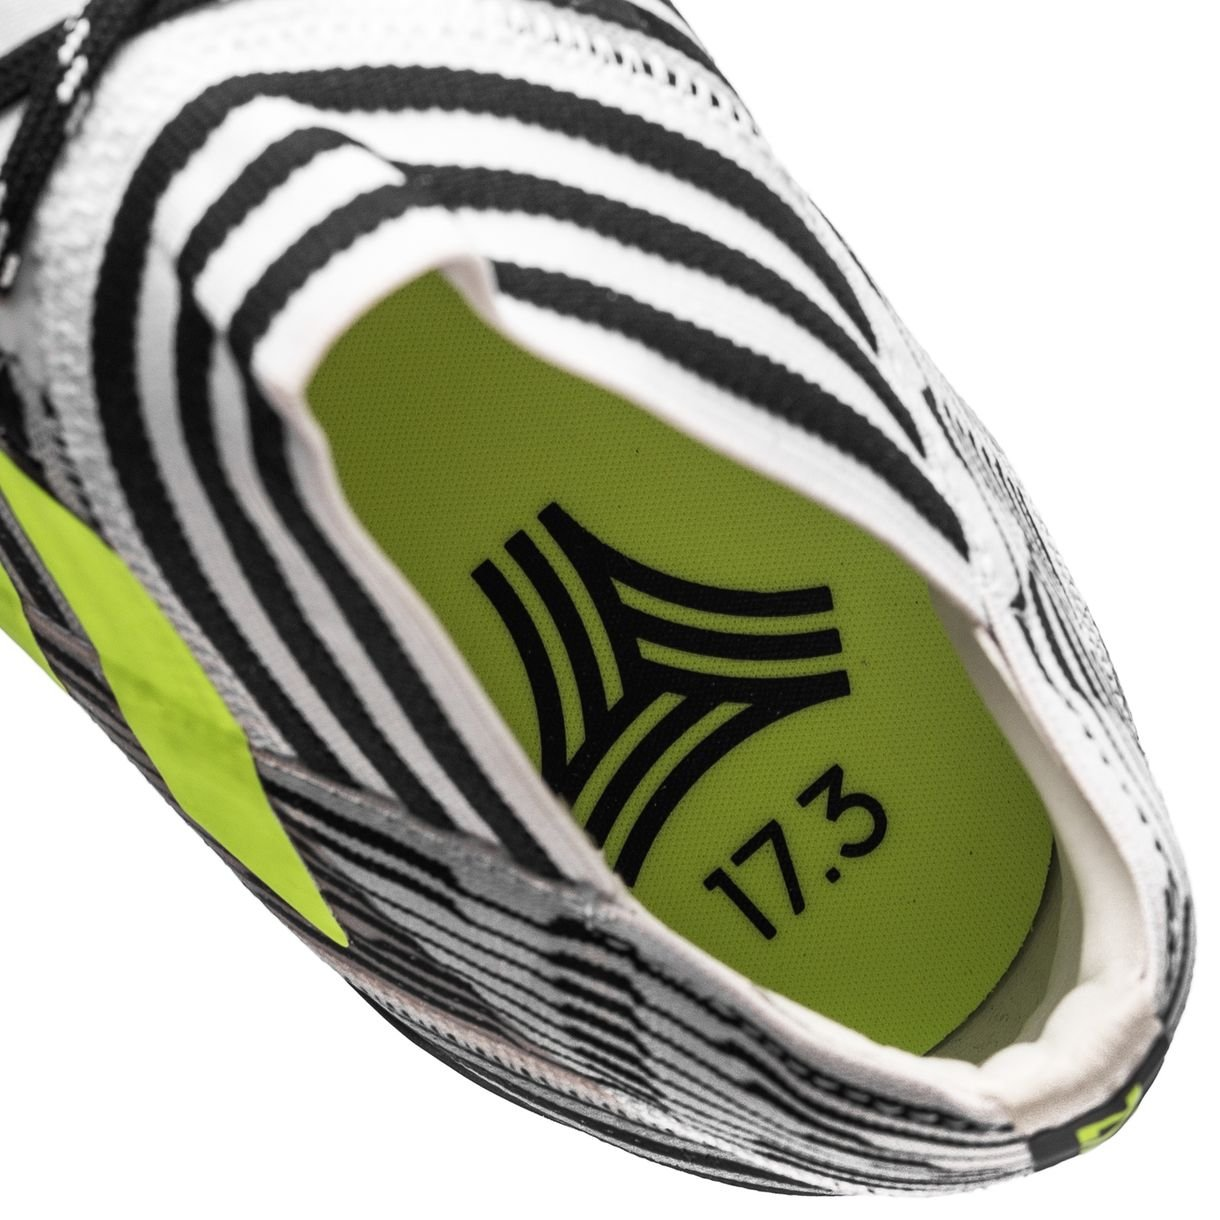 Football shoes adidas NEMEZIZ TANGO 17.3 TF